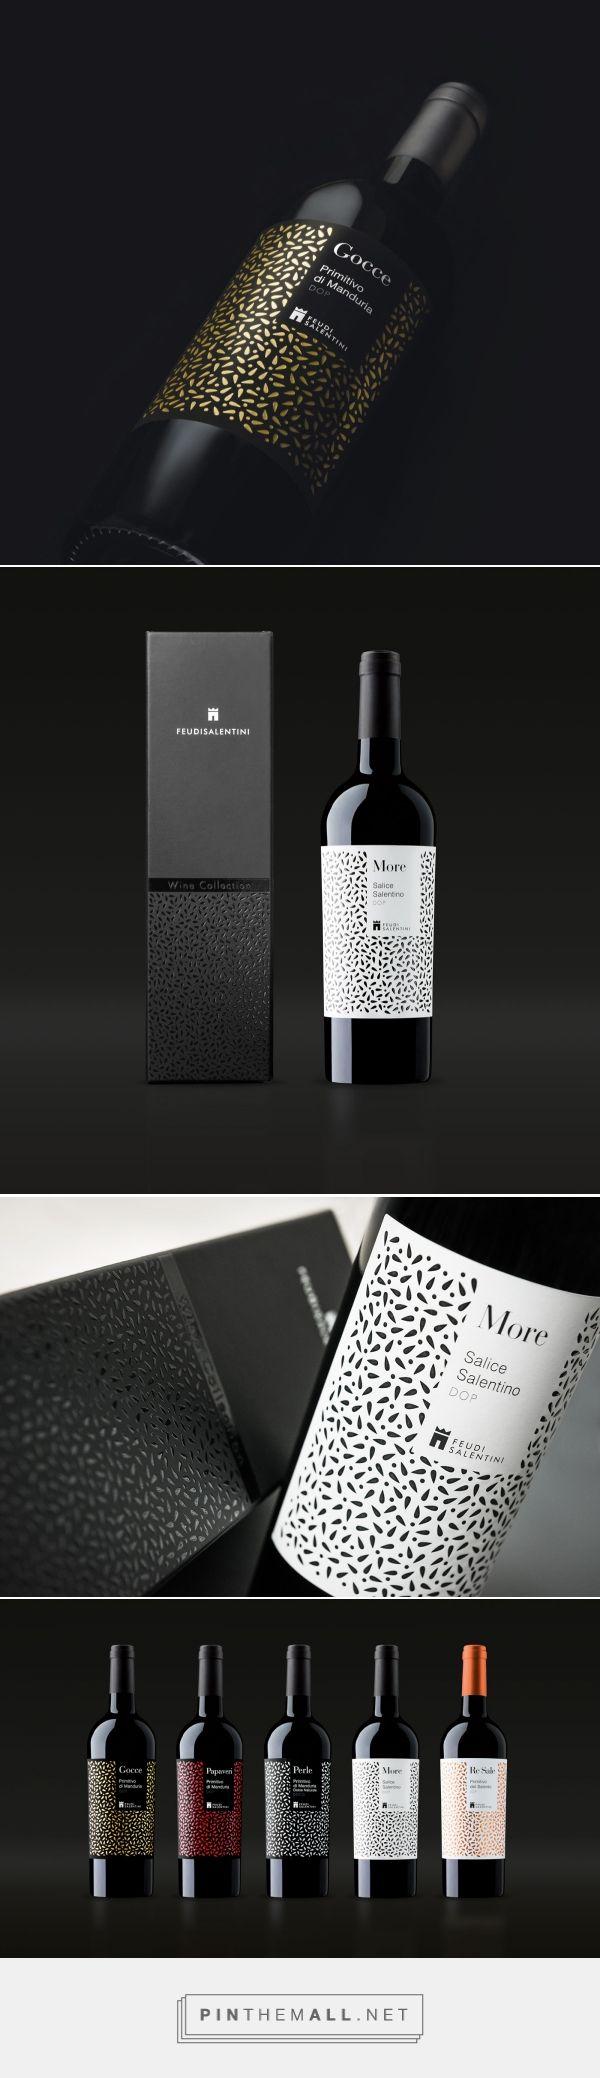 Moderne. Type de vin. Sophistiqué